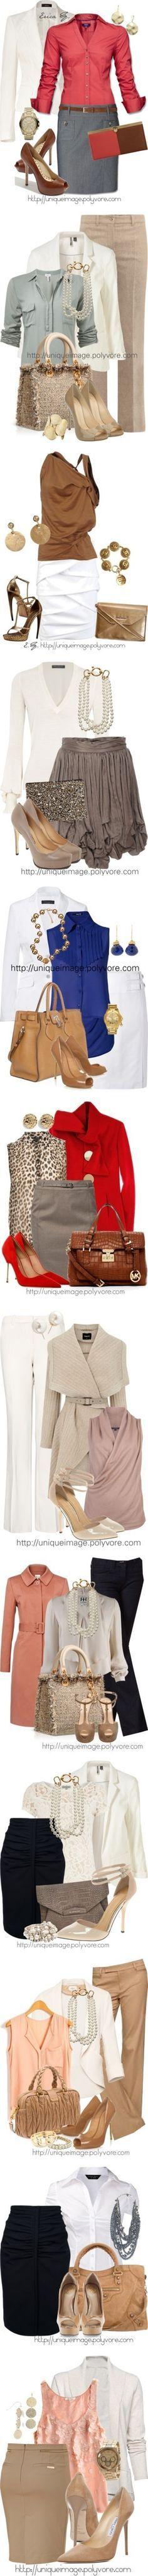 Fashion style...work attire ideas  i used to jus want a job where i could dress like this lol still kinda do tho lol (: